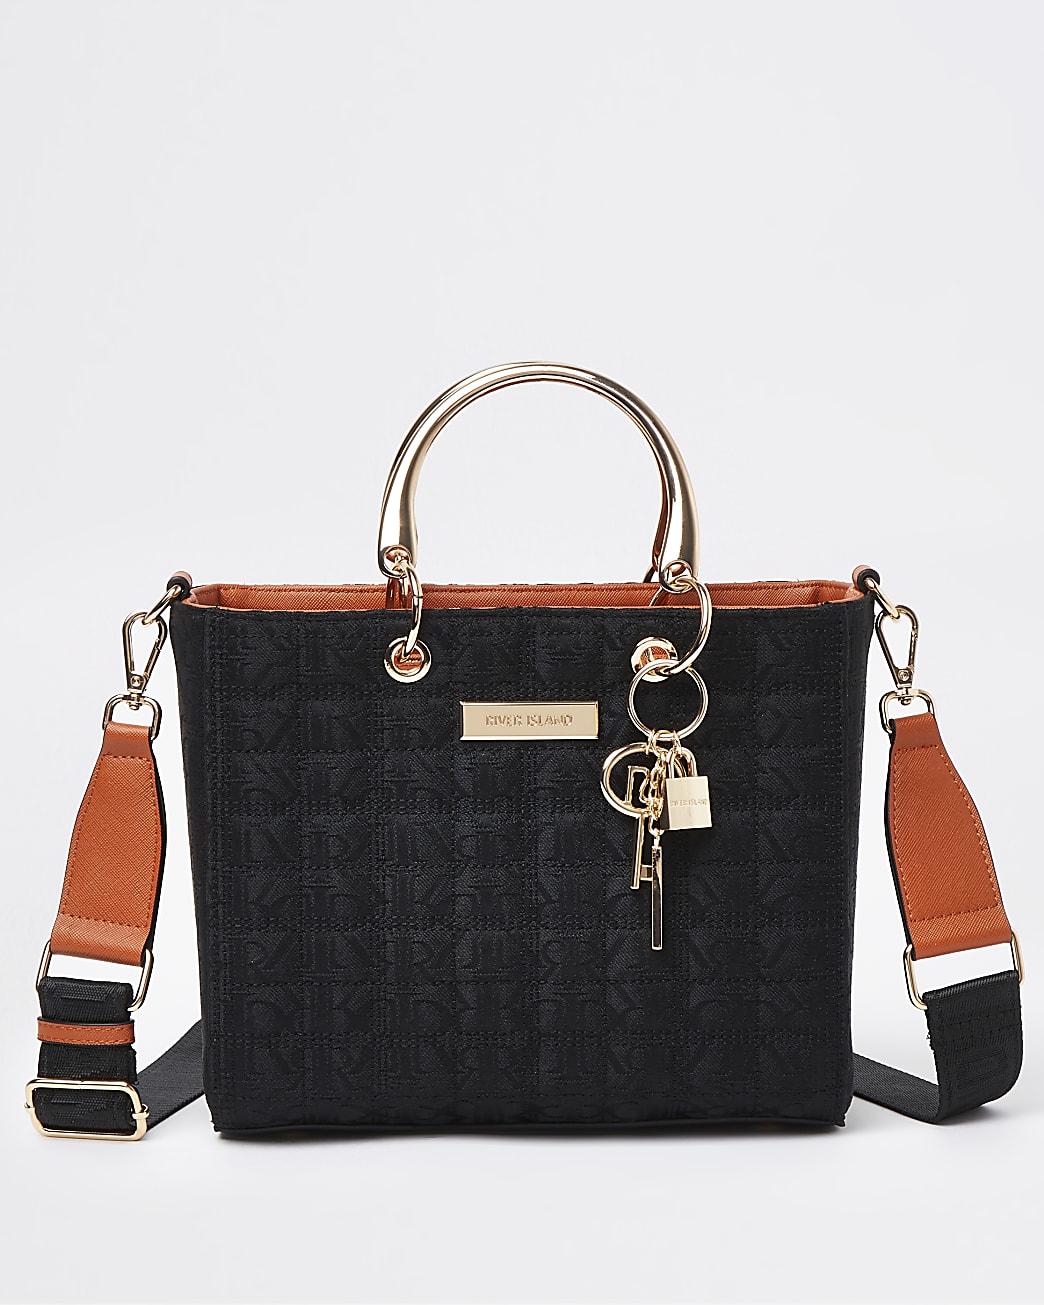 Black jacquard tote bag